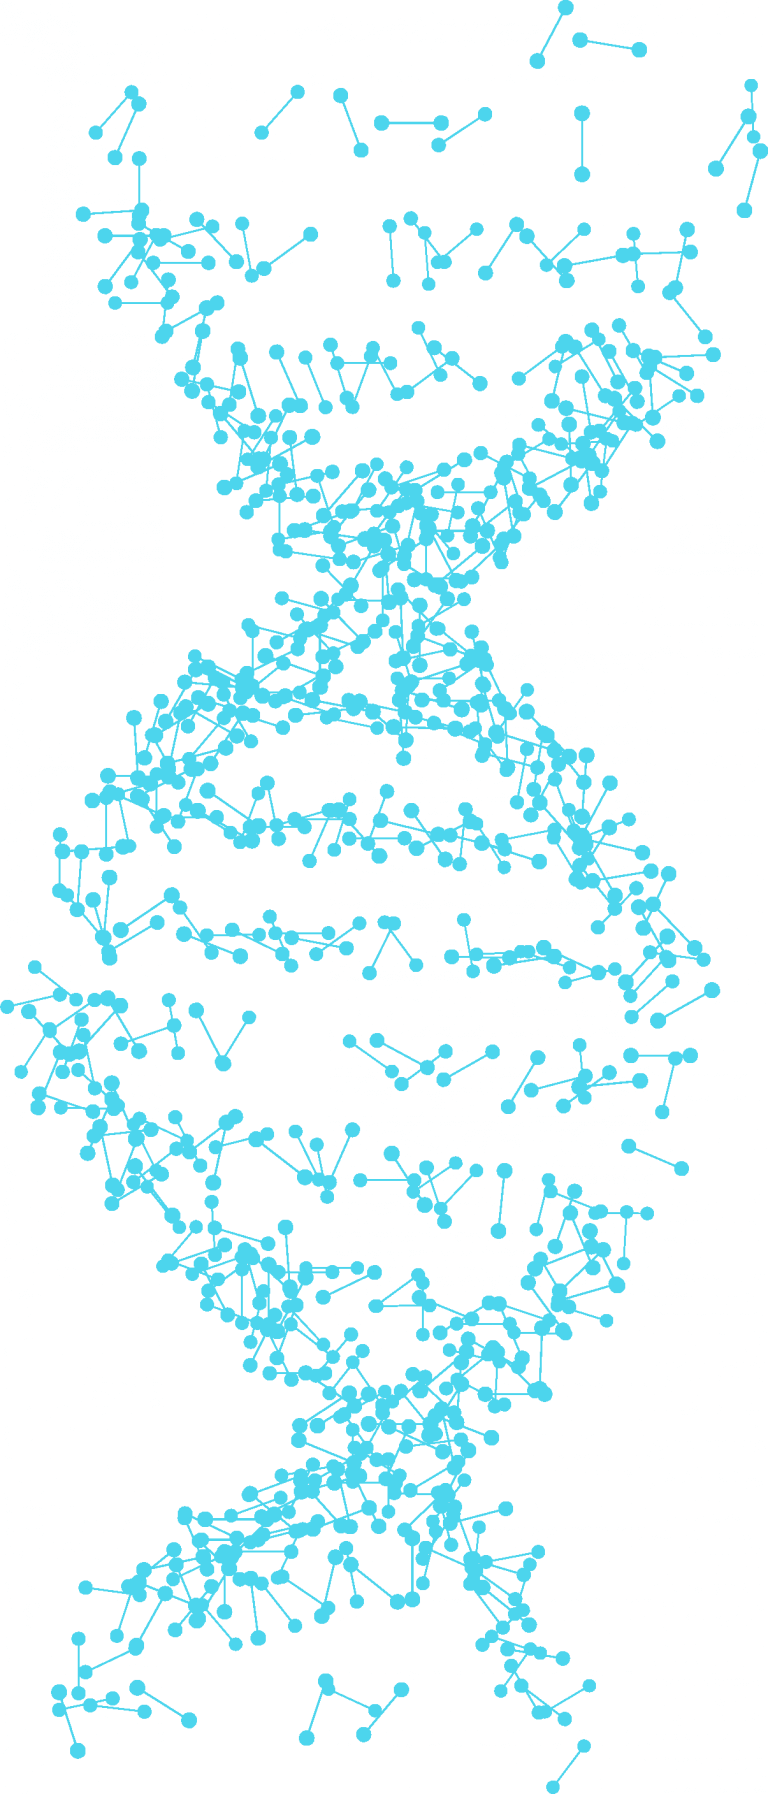 Versorgungsforschung DNA Strang